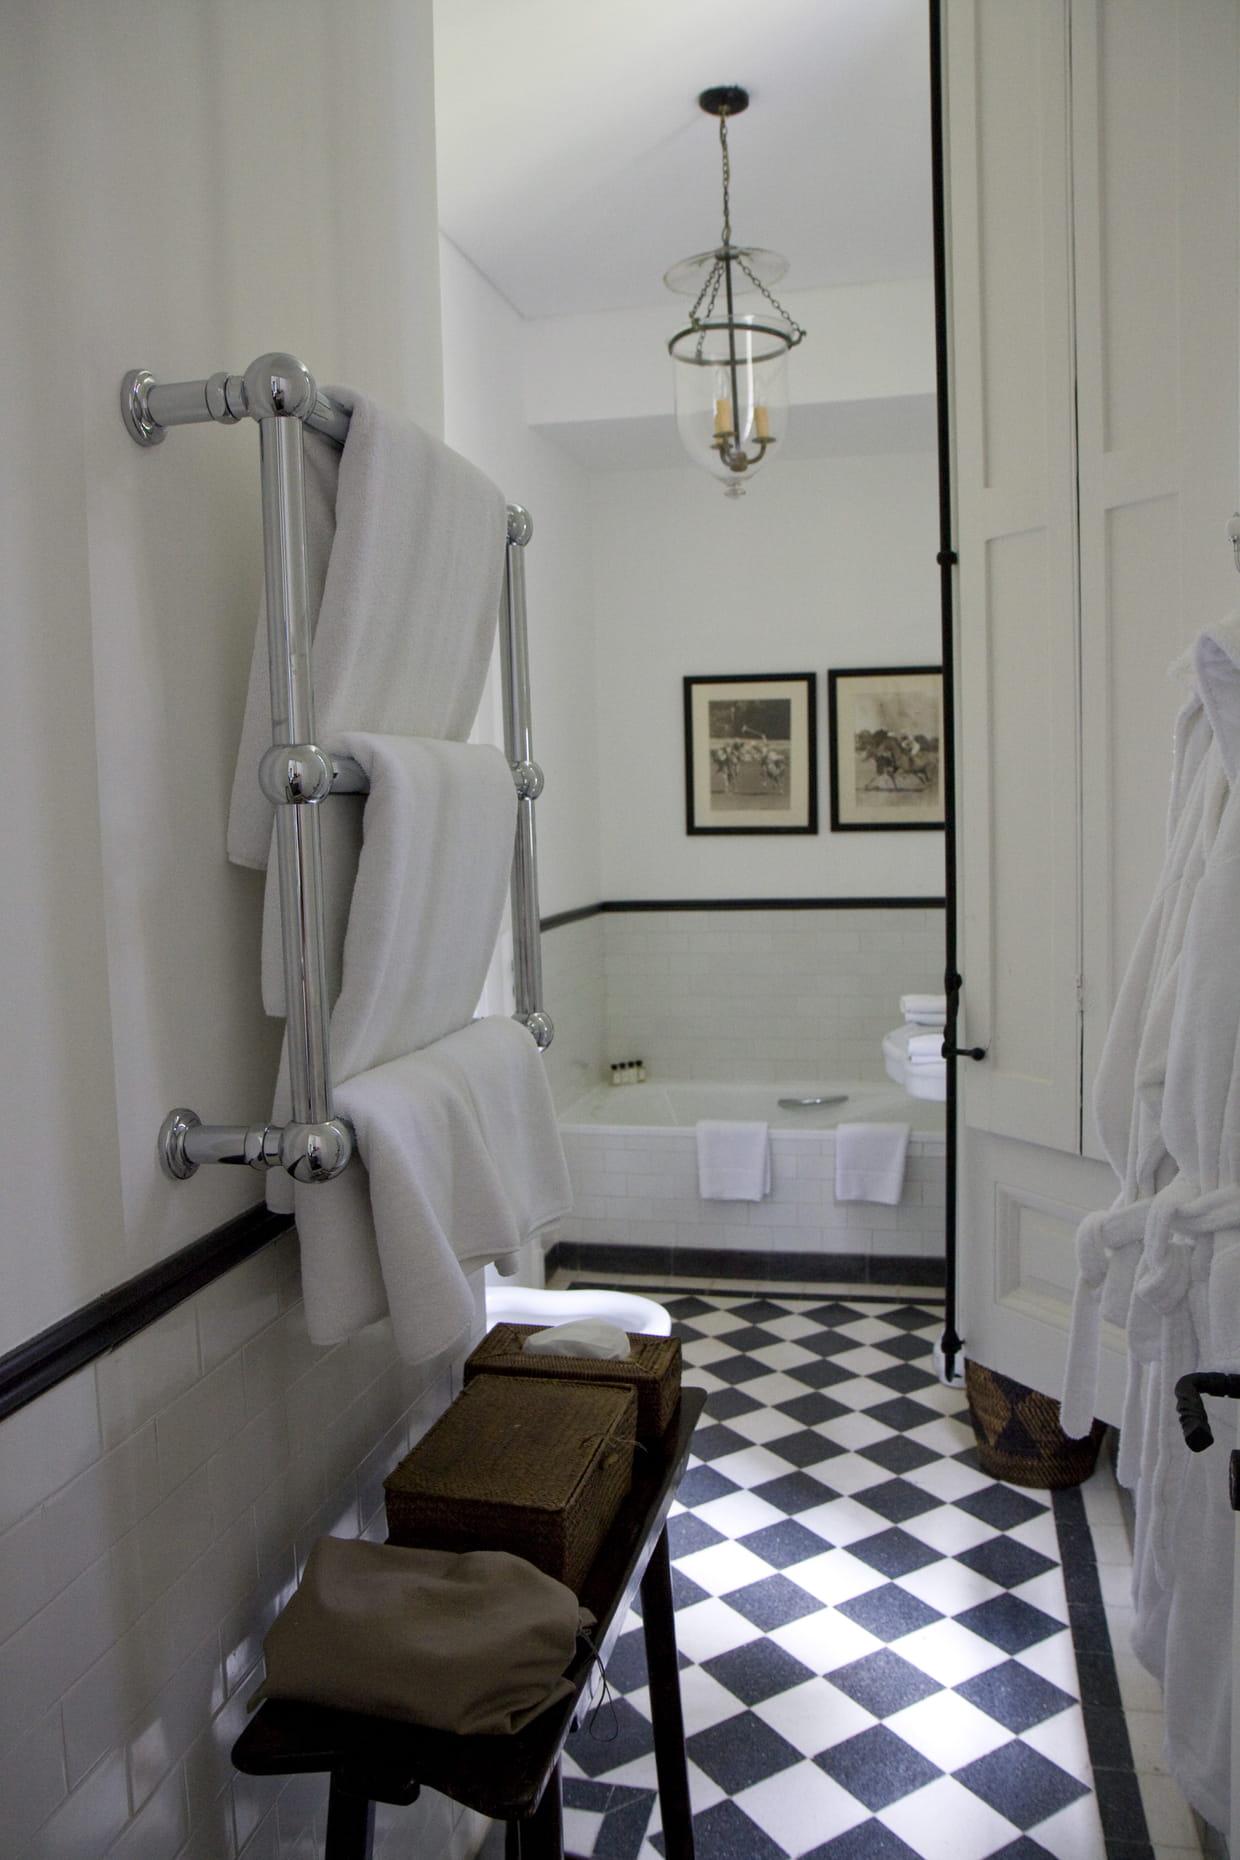 Une salle de bains en damiers